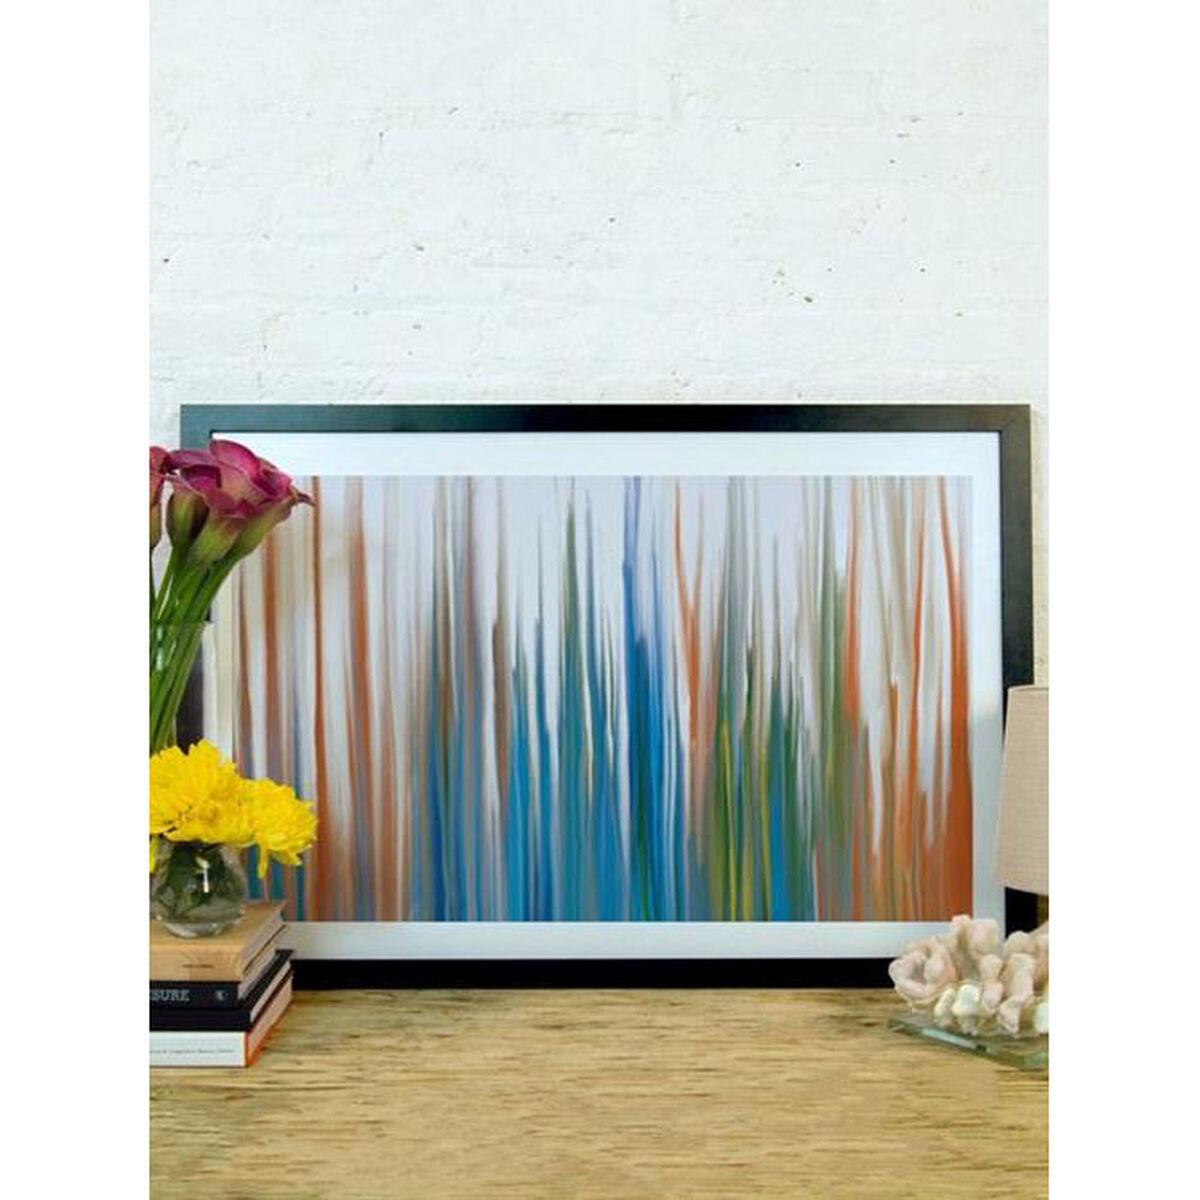 Wall Art Hardwood Frame Ffc28 1pfa 24x16 Fm01 Bizchaircom